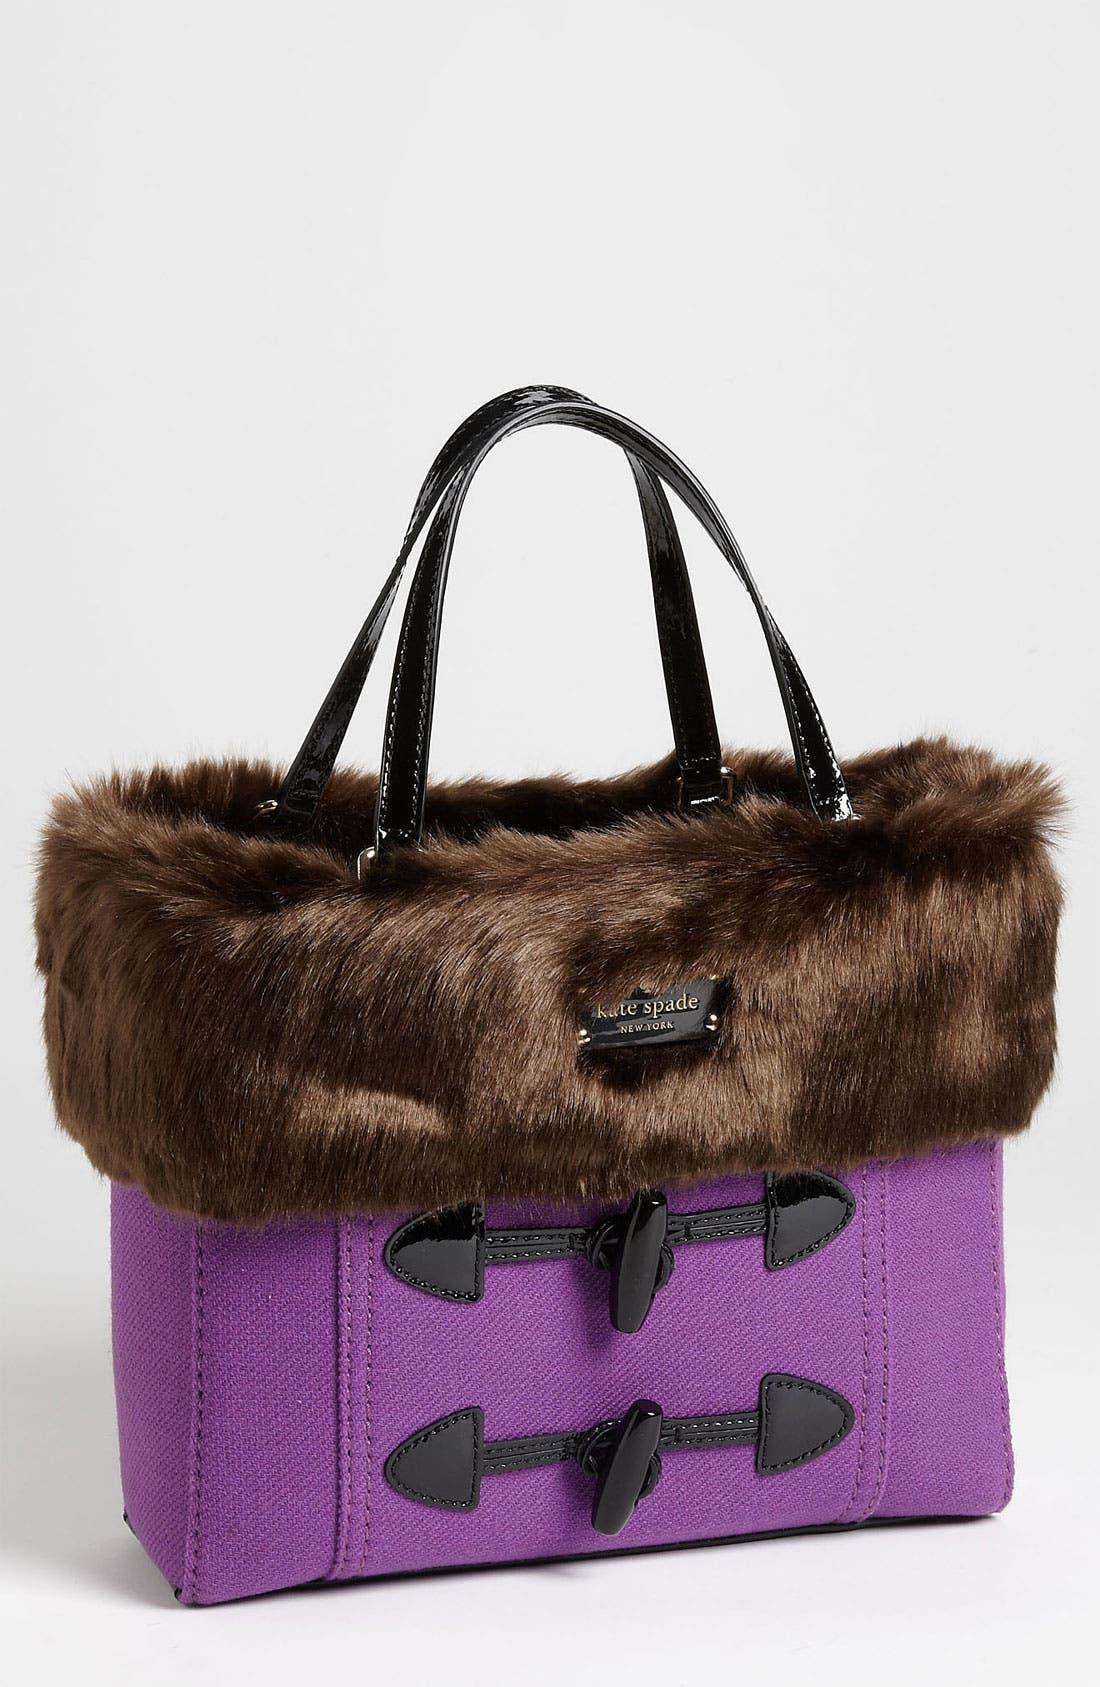 Main Image - kate spade new york 'foxtrot hill - quinn' handbag